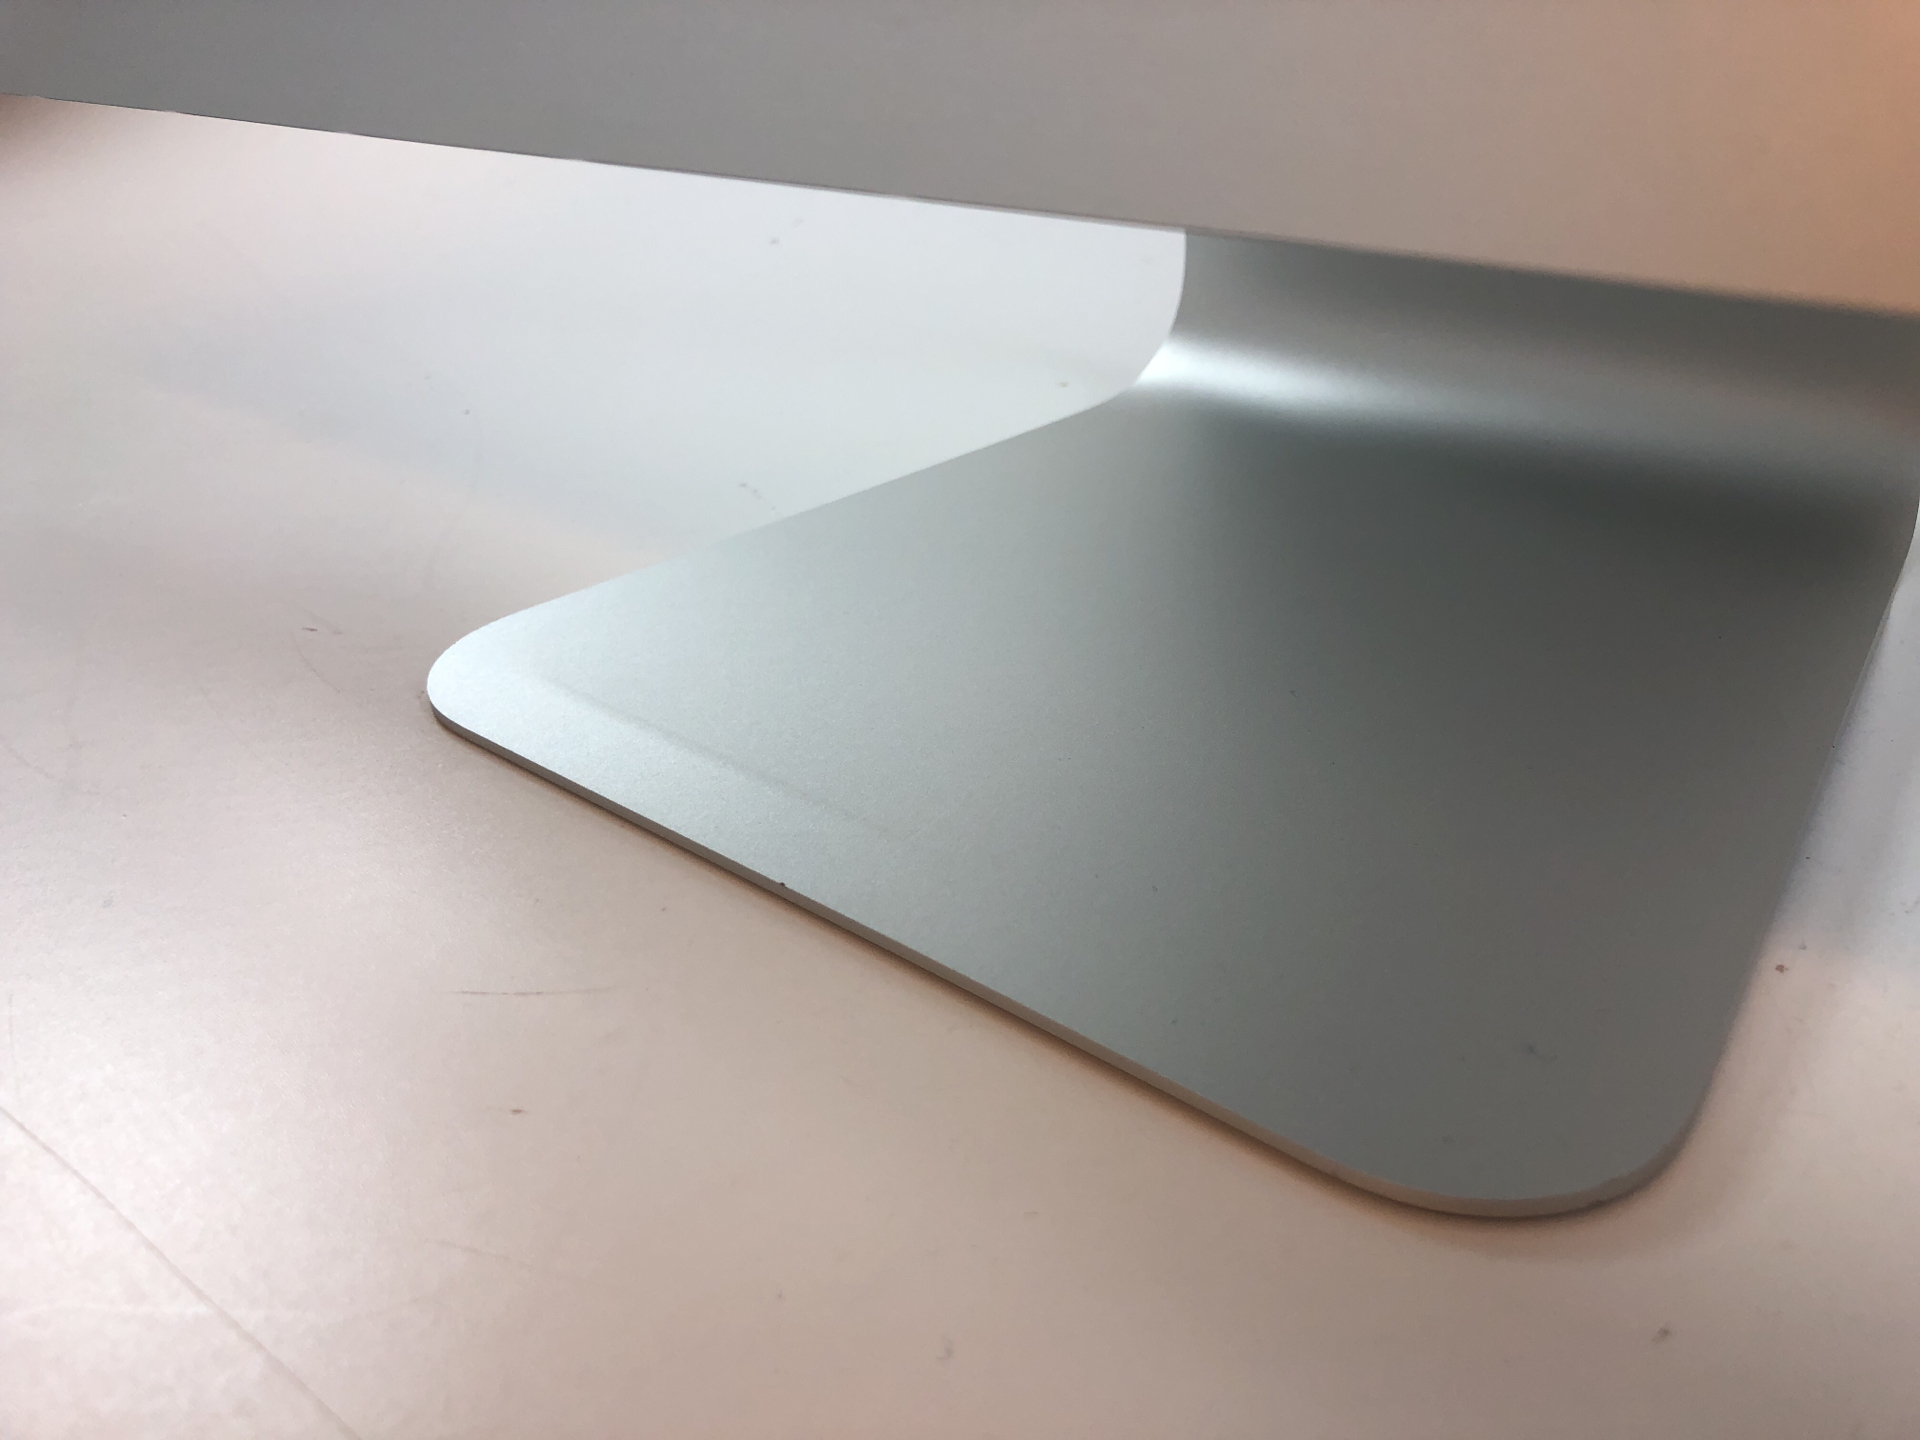 "iMac 27"" Late 2013 (Intel Quad-Core i7 3.5 GHz 32 GB RAM 1 TB Fusion Drive), Intel Quad-Core i7 3.5 GHz, 32 GB RAM, 1 TB Fusion Drive, Kuva 3"